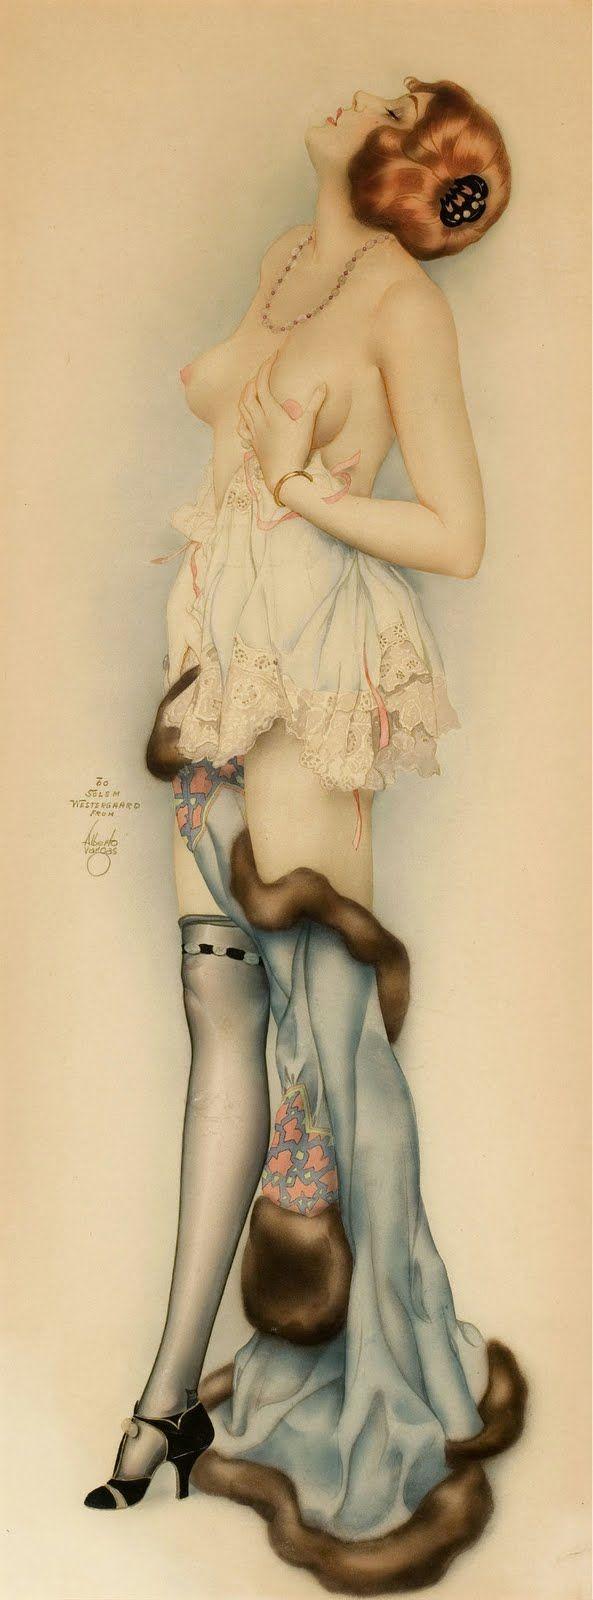 Alberto Vargas Posters Illustrations Vintage Photos